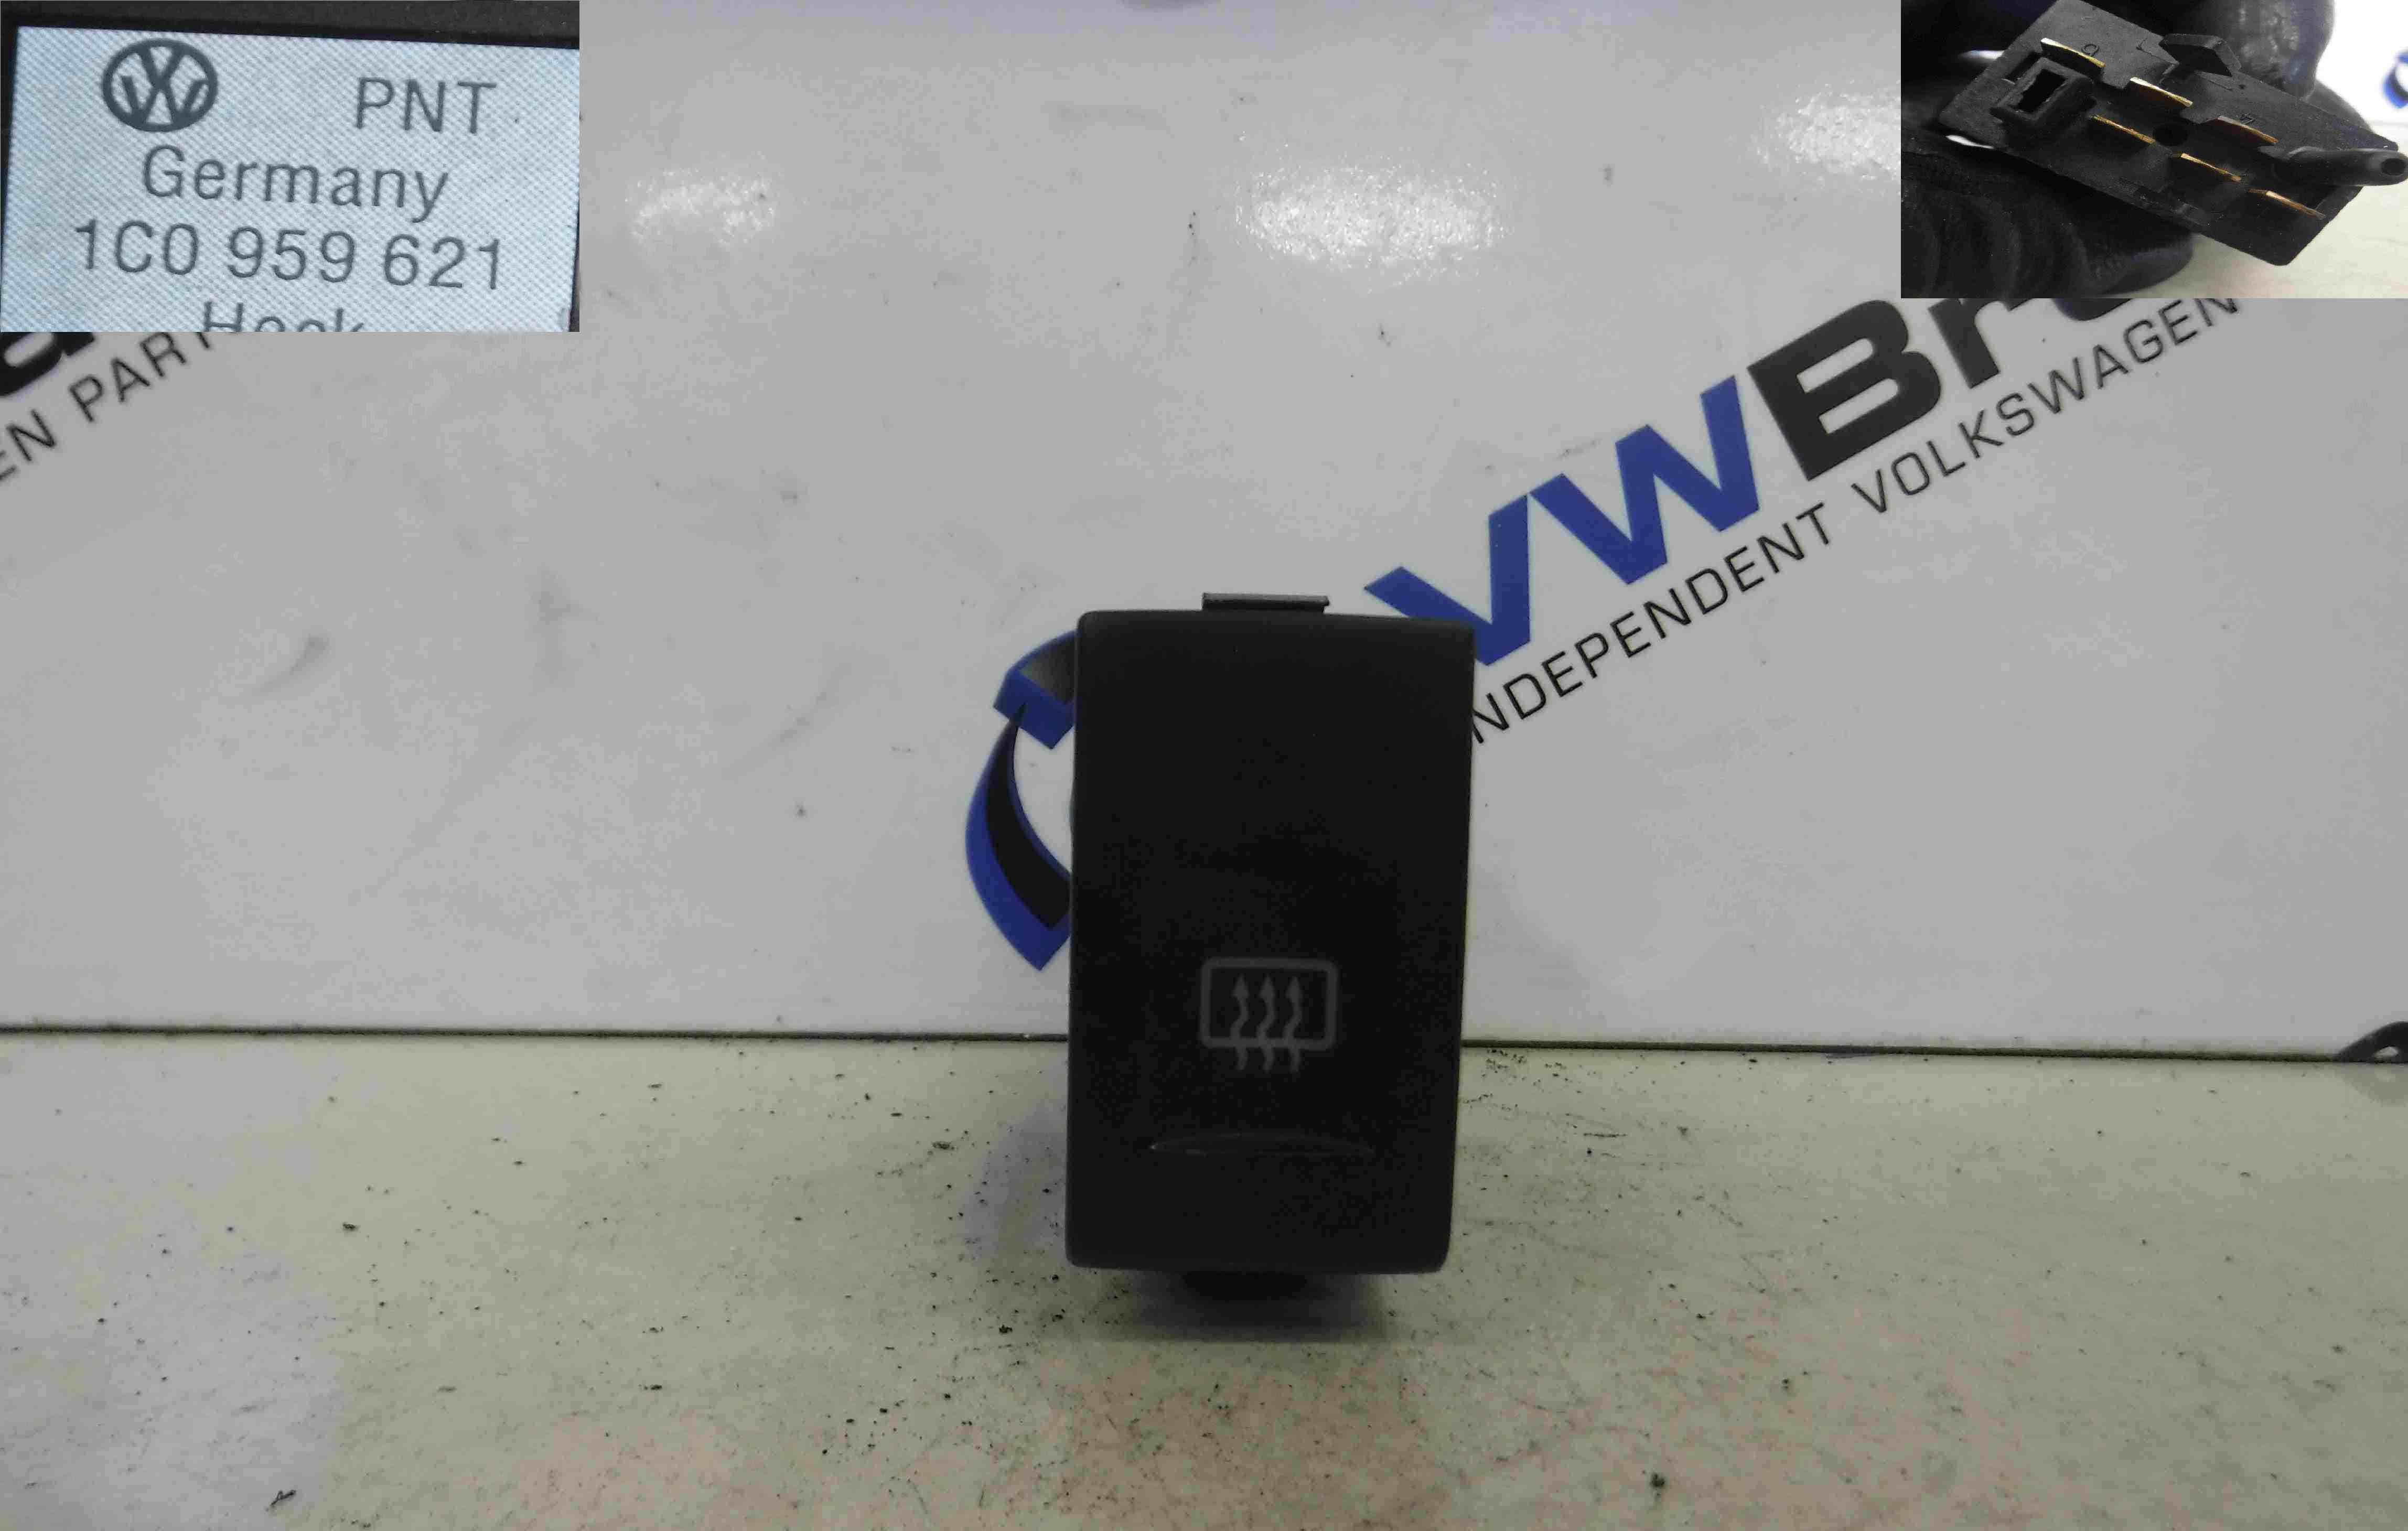 Volkswagen Beetle 1999-2006 Rear Heated Demister Switch Button 1c0959621